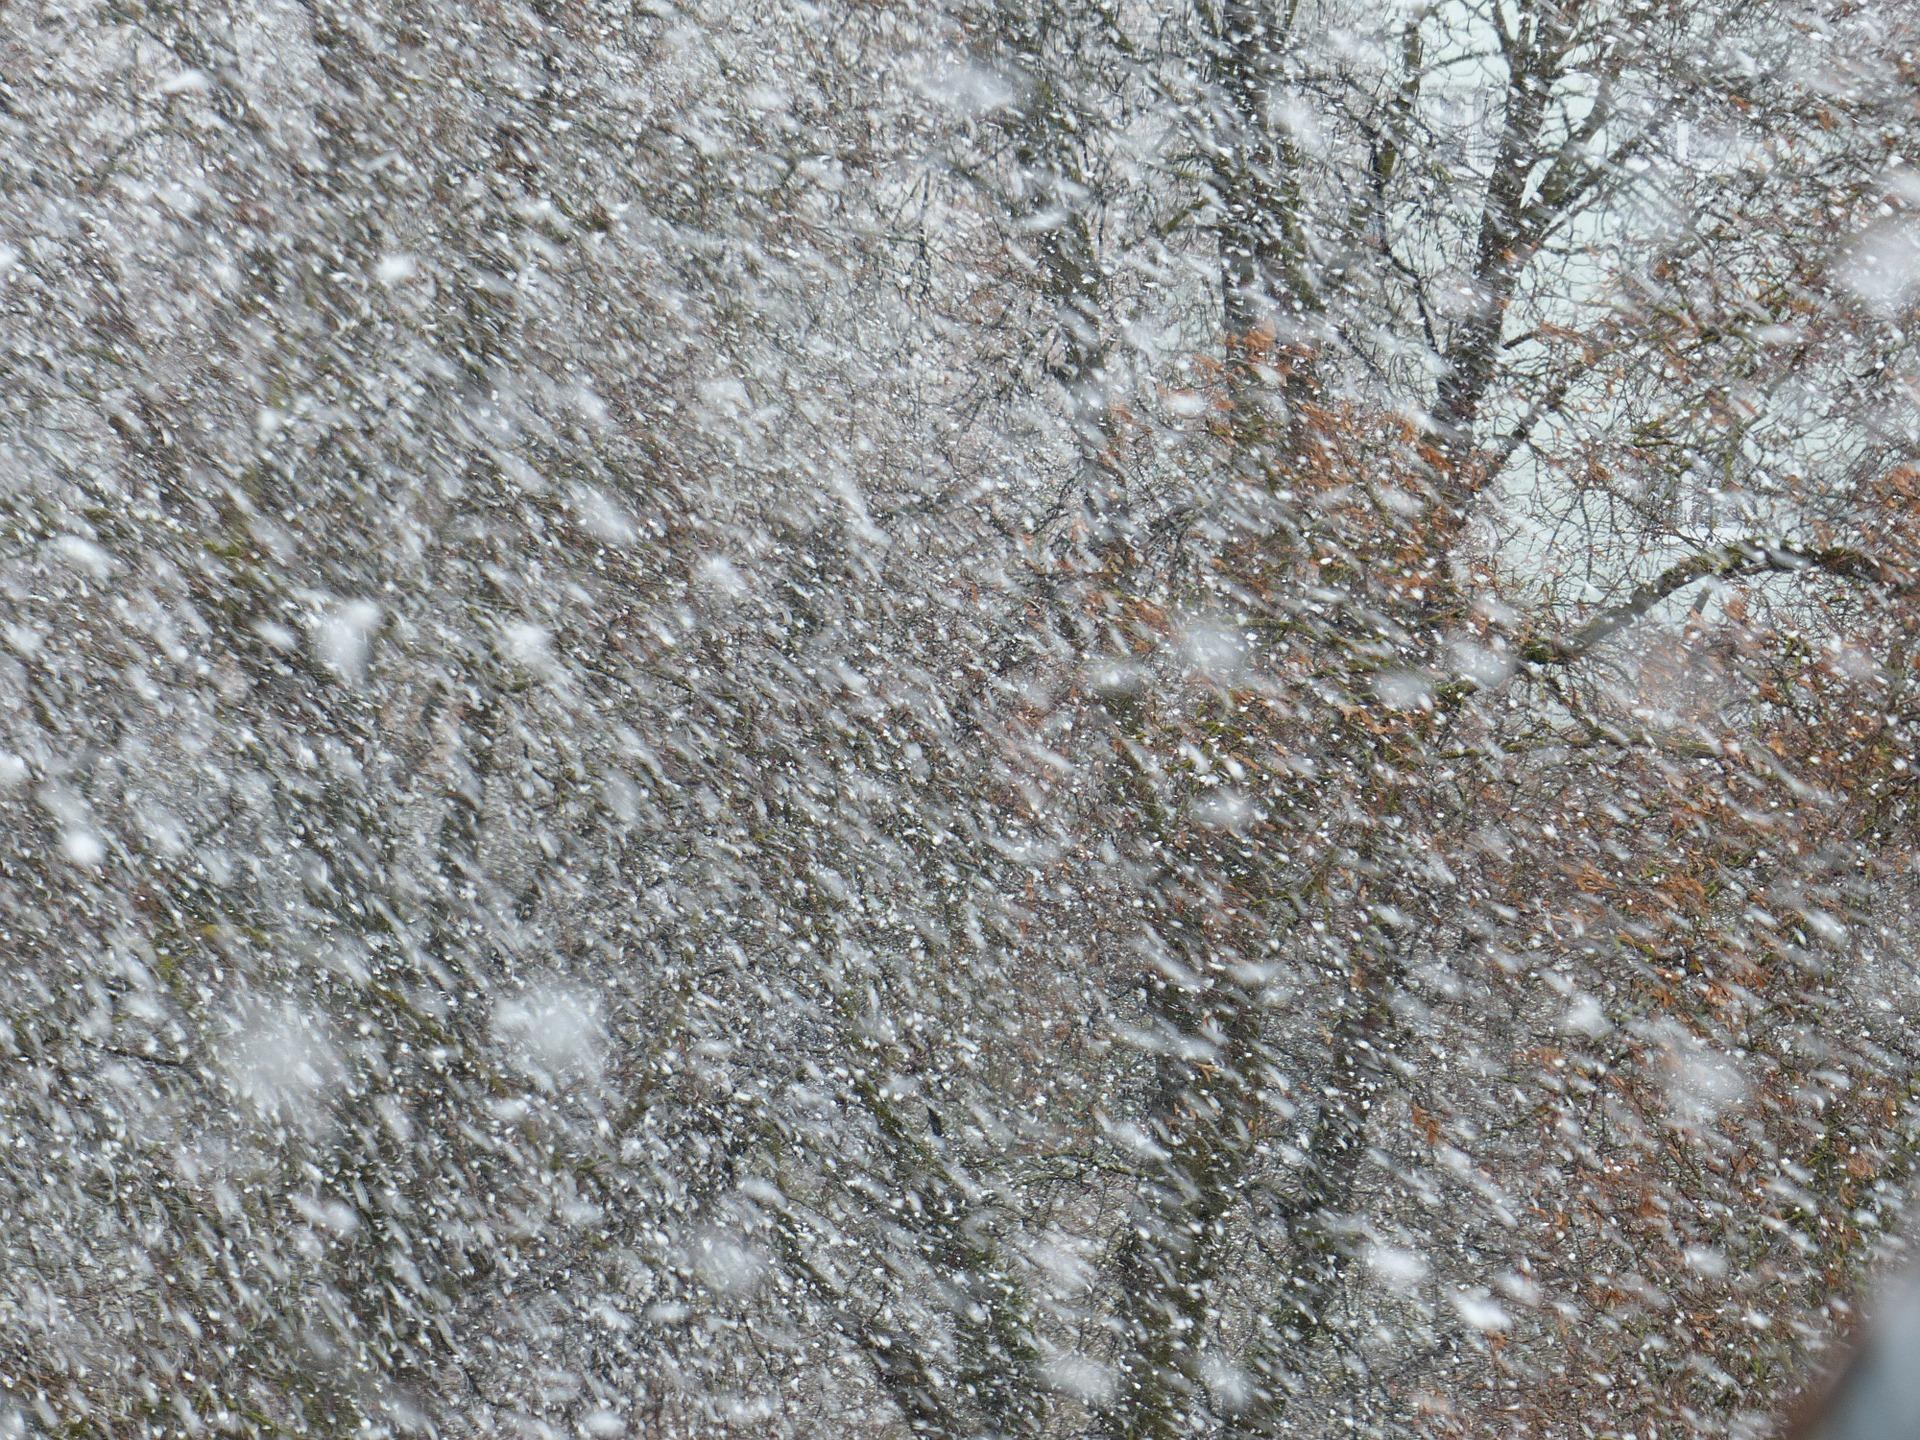 Lumisade, lumimyrsky